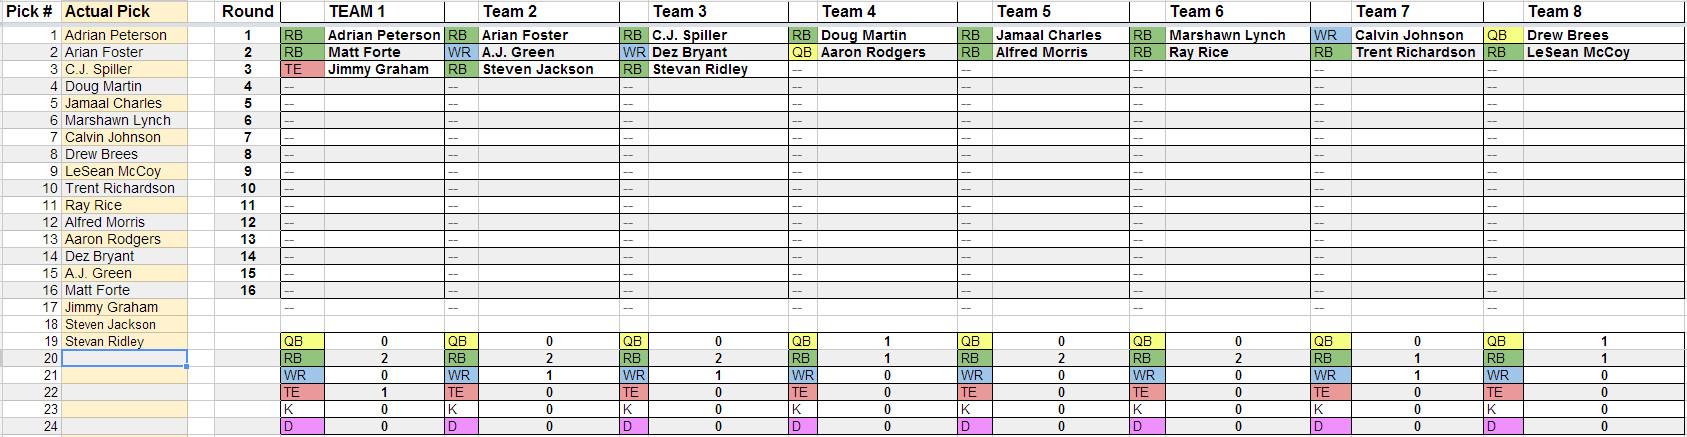 Fantasy Football Draft Spreadsheet Template Microsoft Excel Fantasy Football Template Full Version